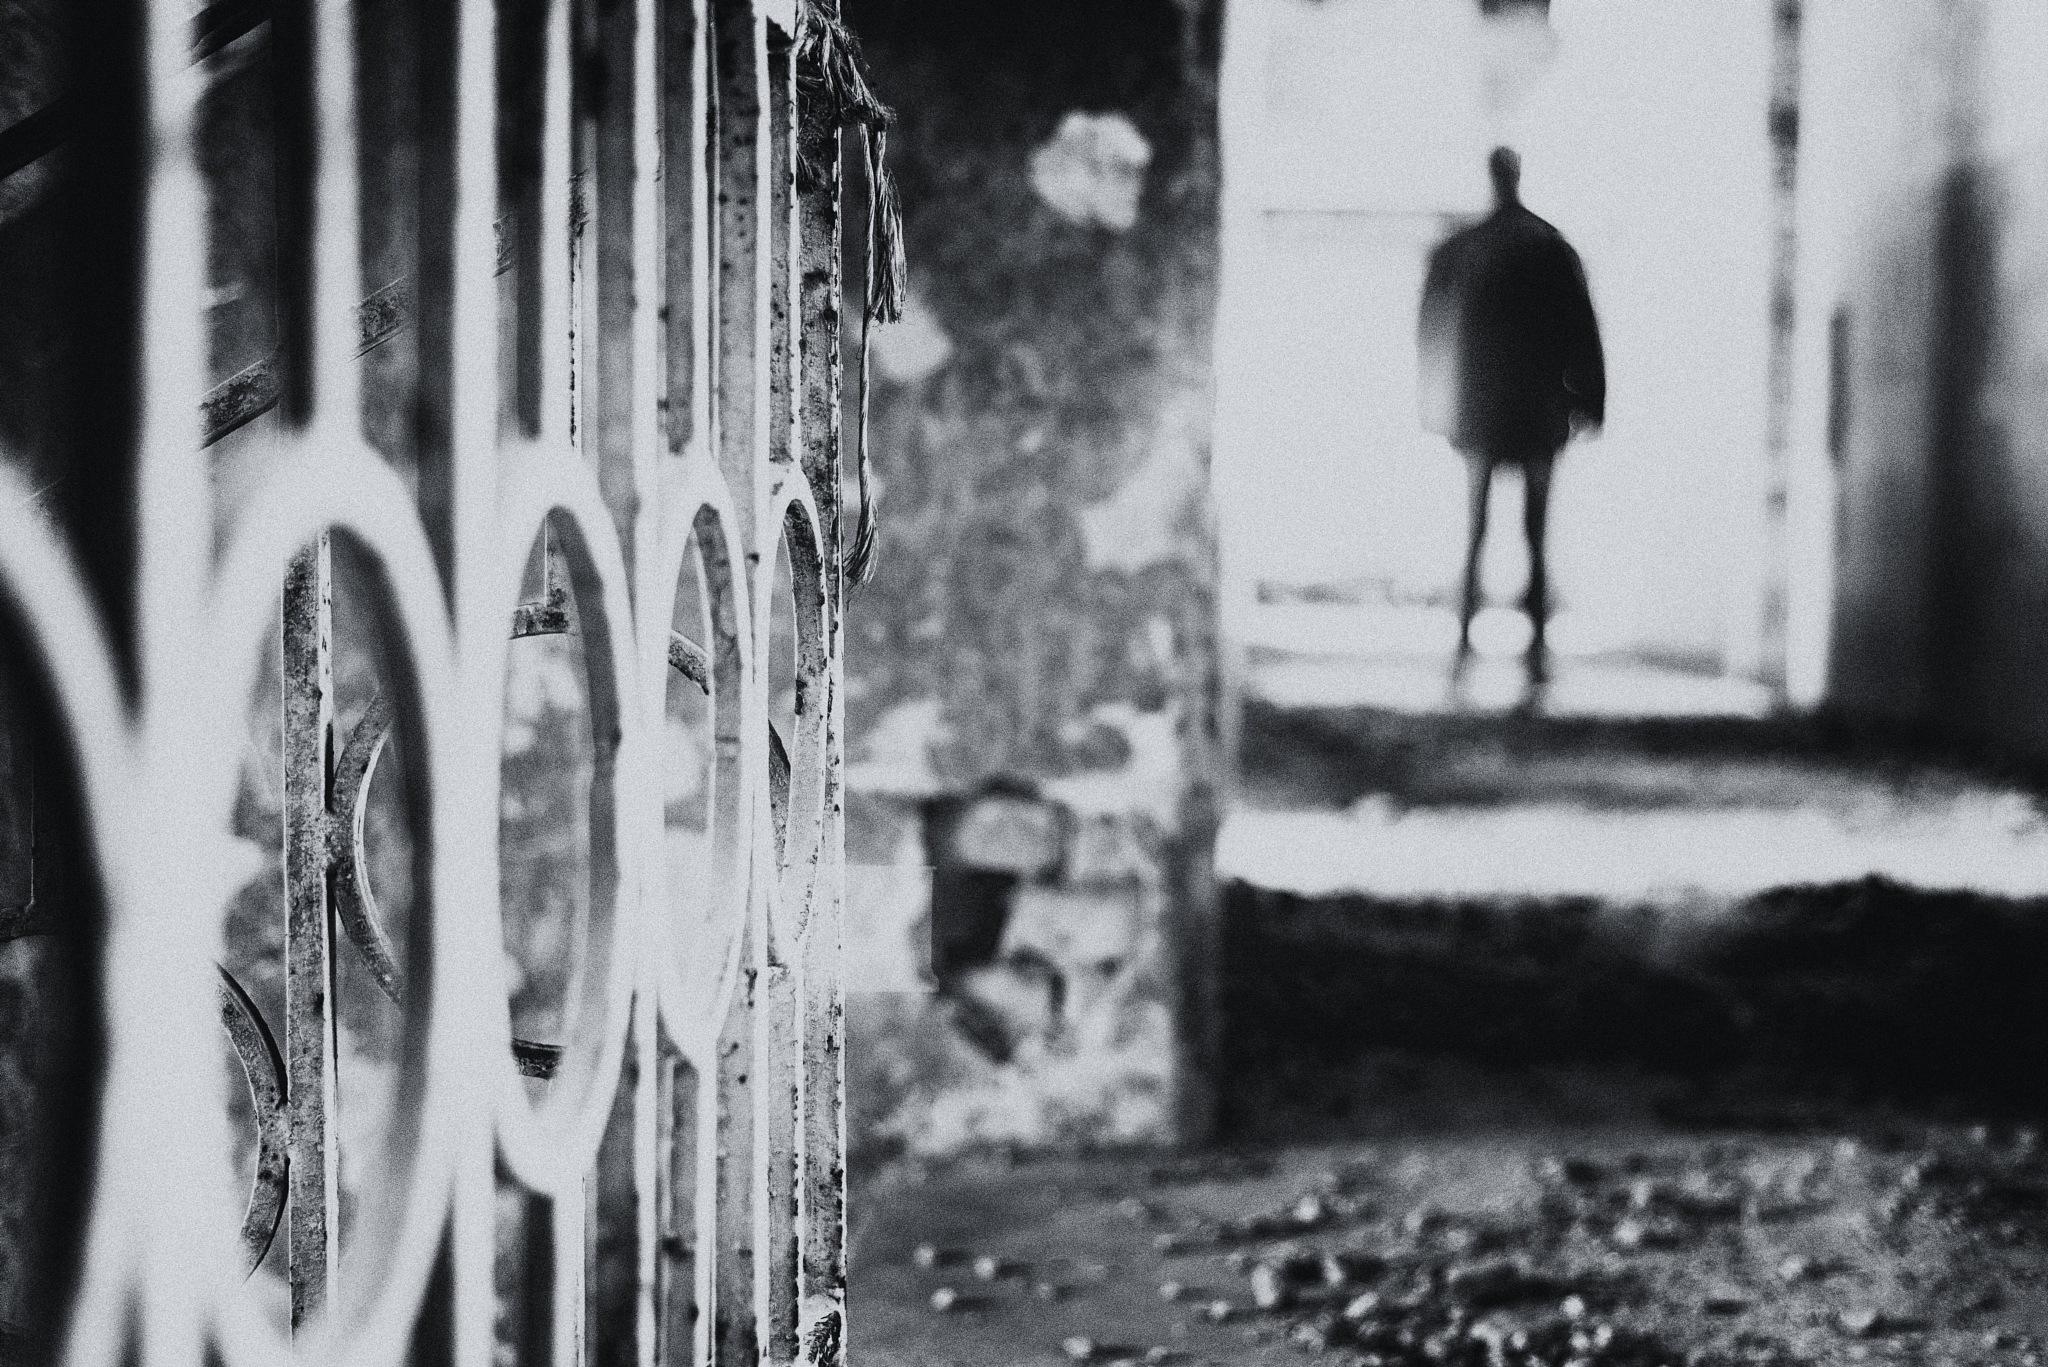 Creepy moment by Nenad Milic